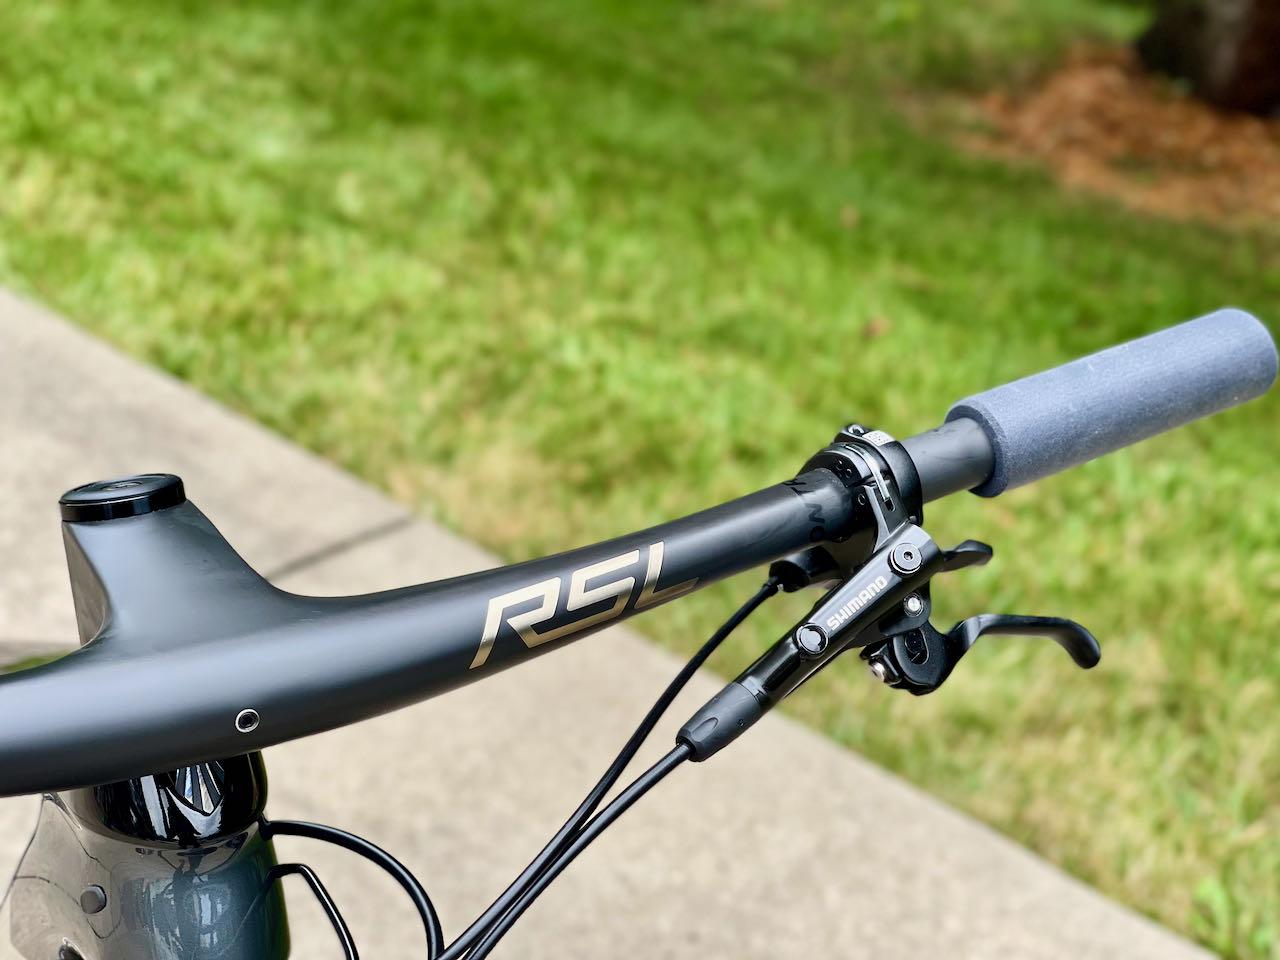 Bontrager RSL MTB Bars installed on bike front view